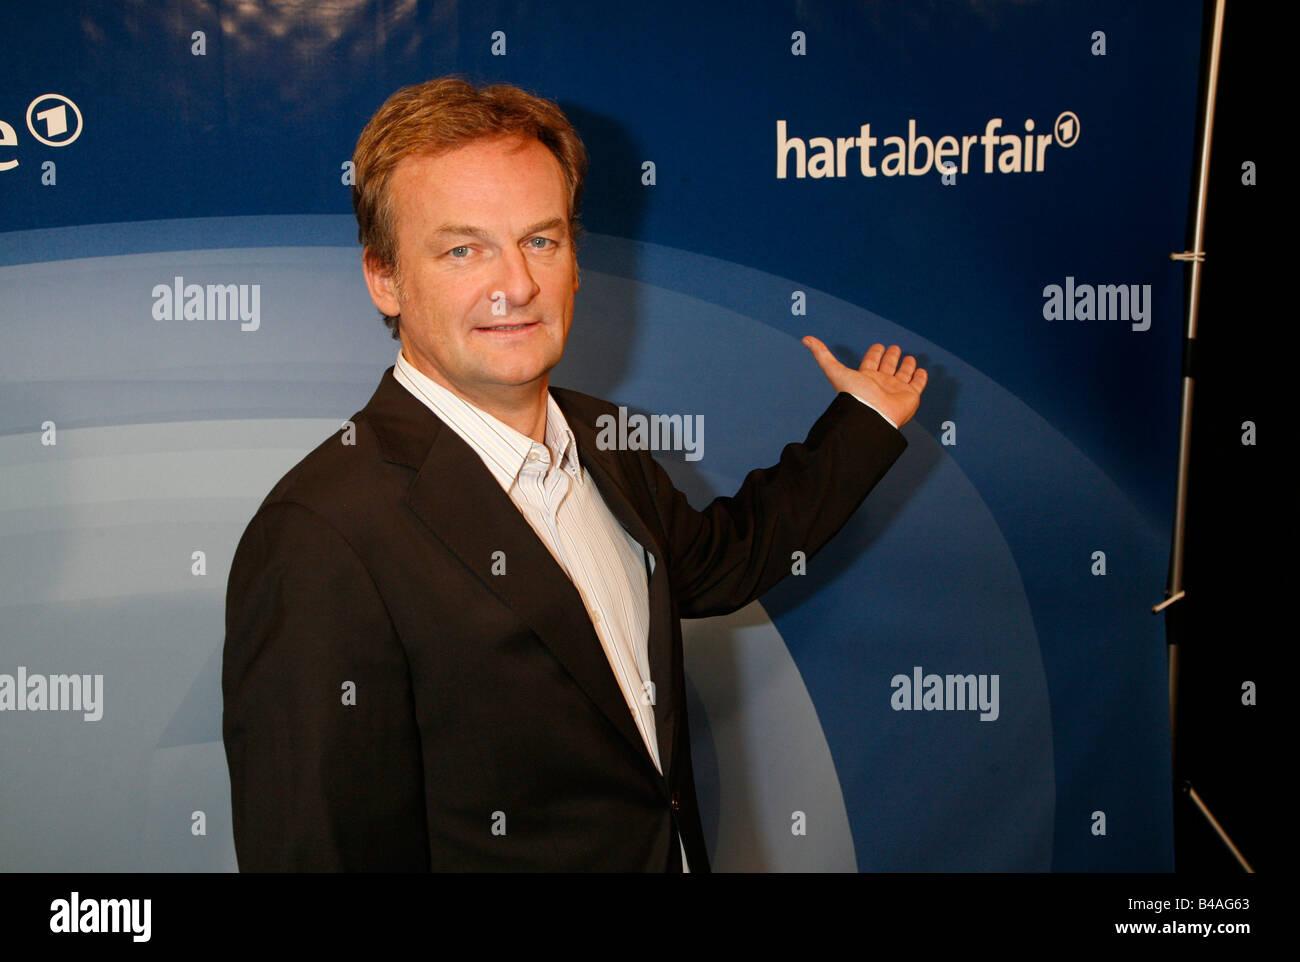 Plasberg, Frank, * 18.5.1957, German journalist and moderator, half length, photo call to the ARD telecast 'Hart - Stock Image